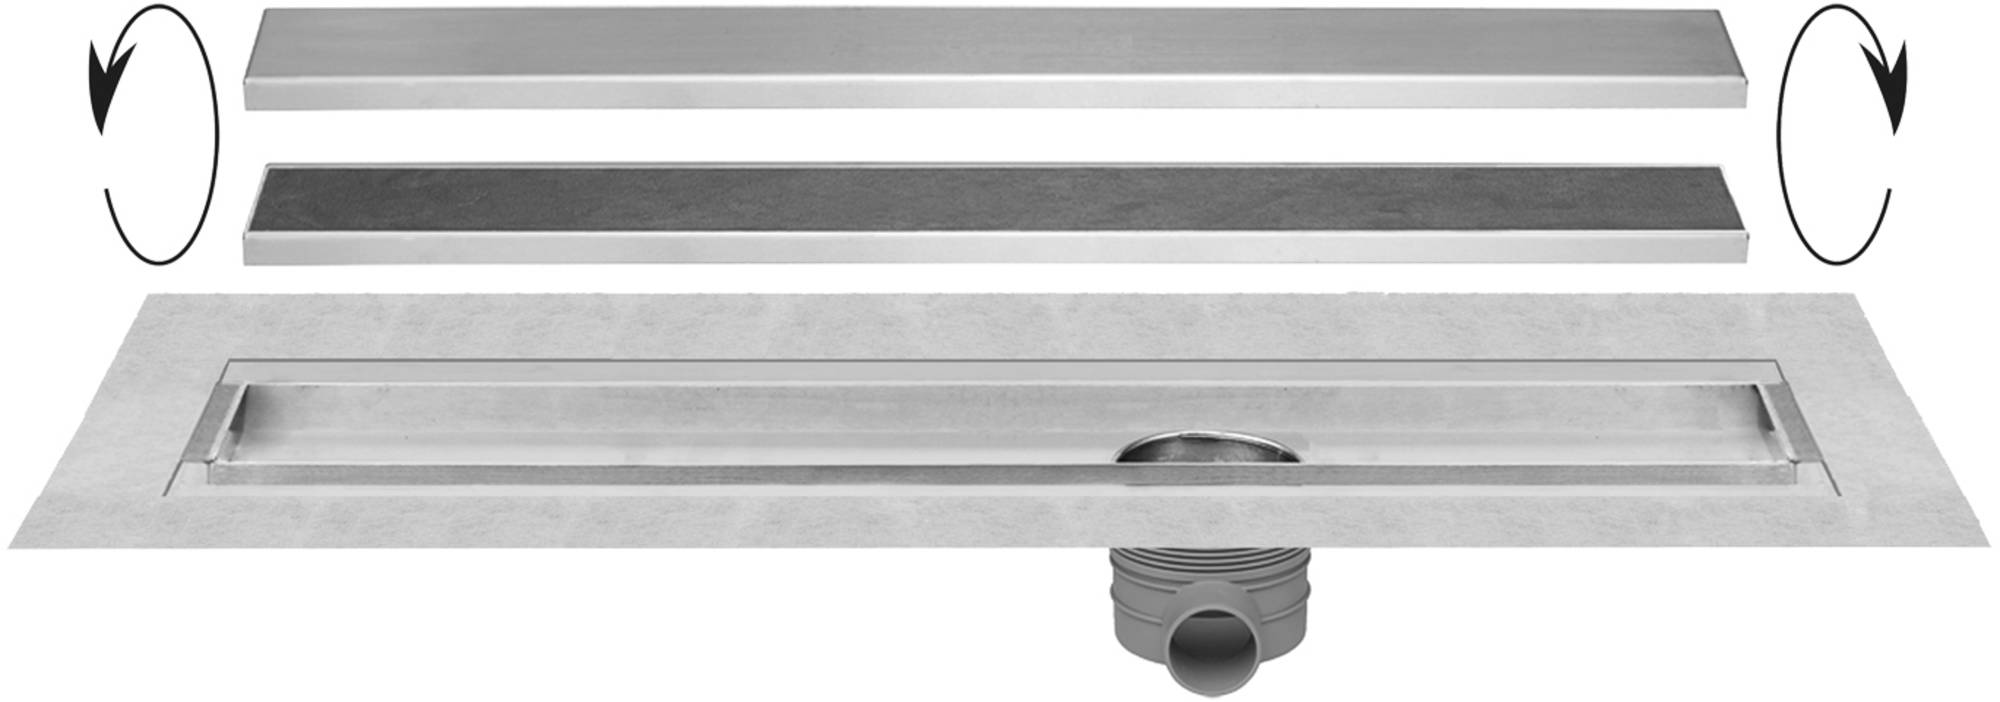 Easy Drain Multi TAF afvoergoot 70 cm rooster als zero of tegel design RVS